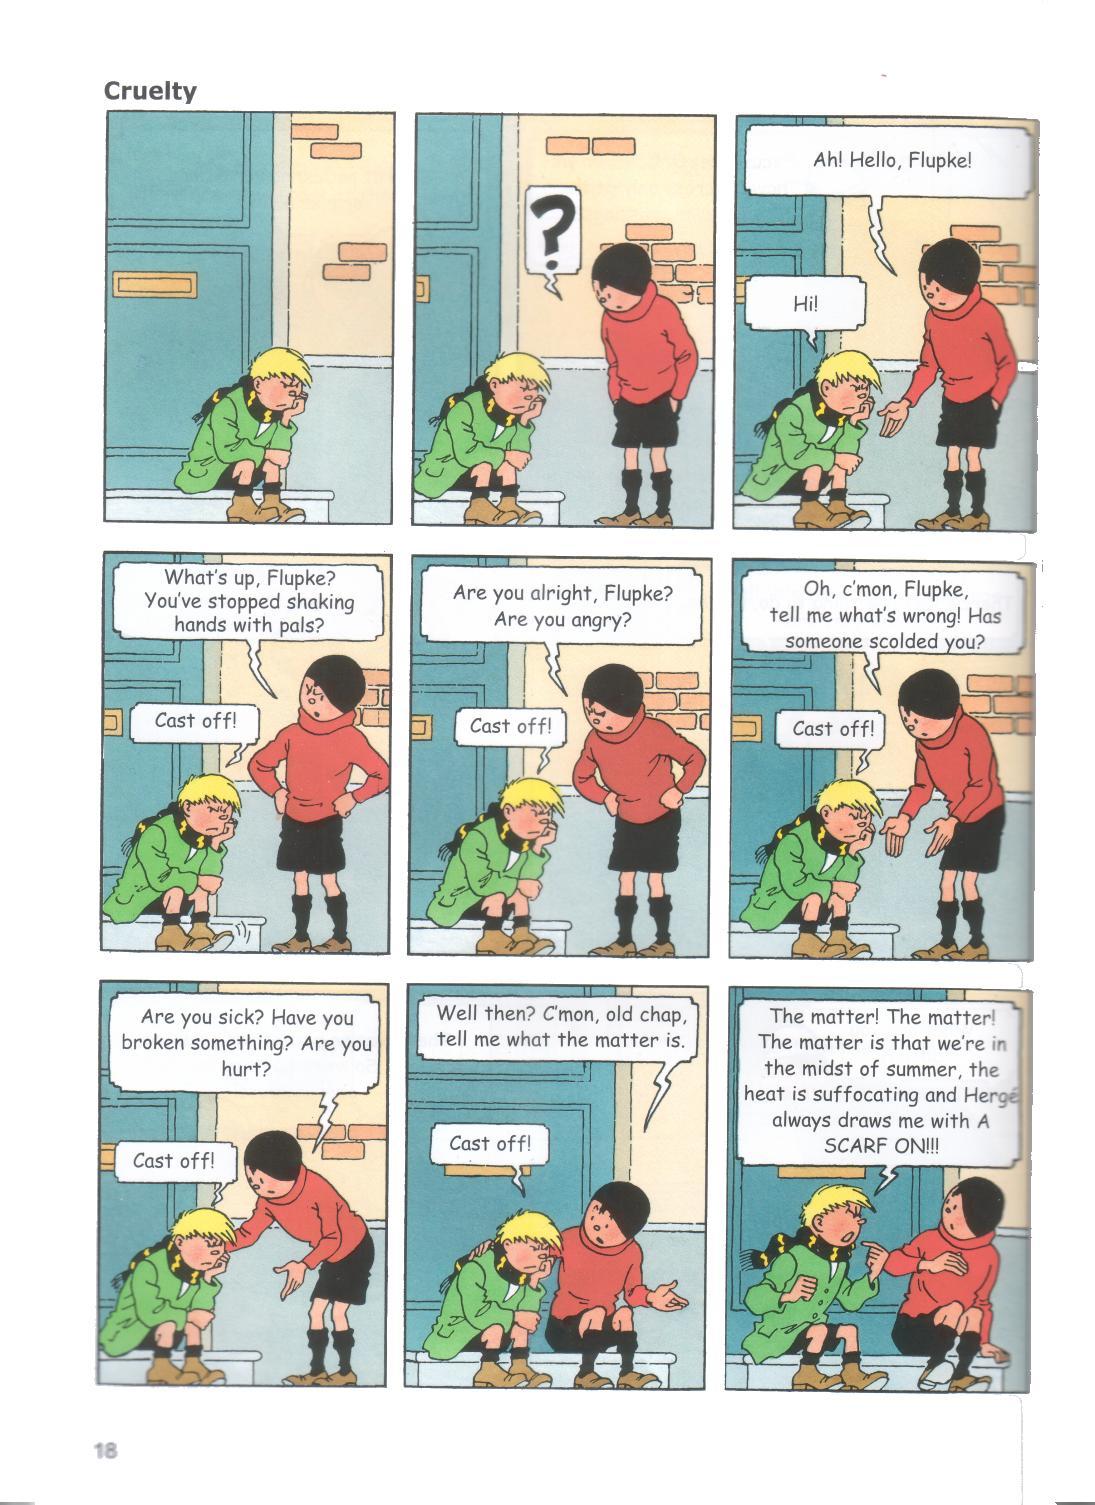 13 Cameos Of Herge, Tintin, Quick & Flupke, Mr. Mops